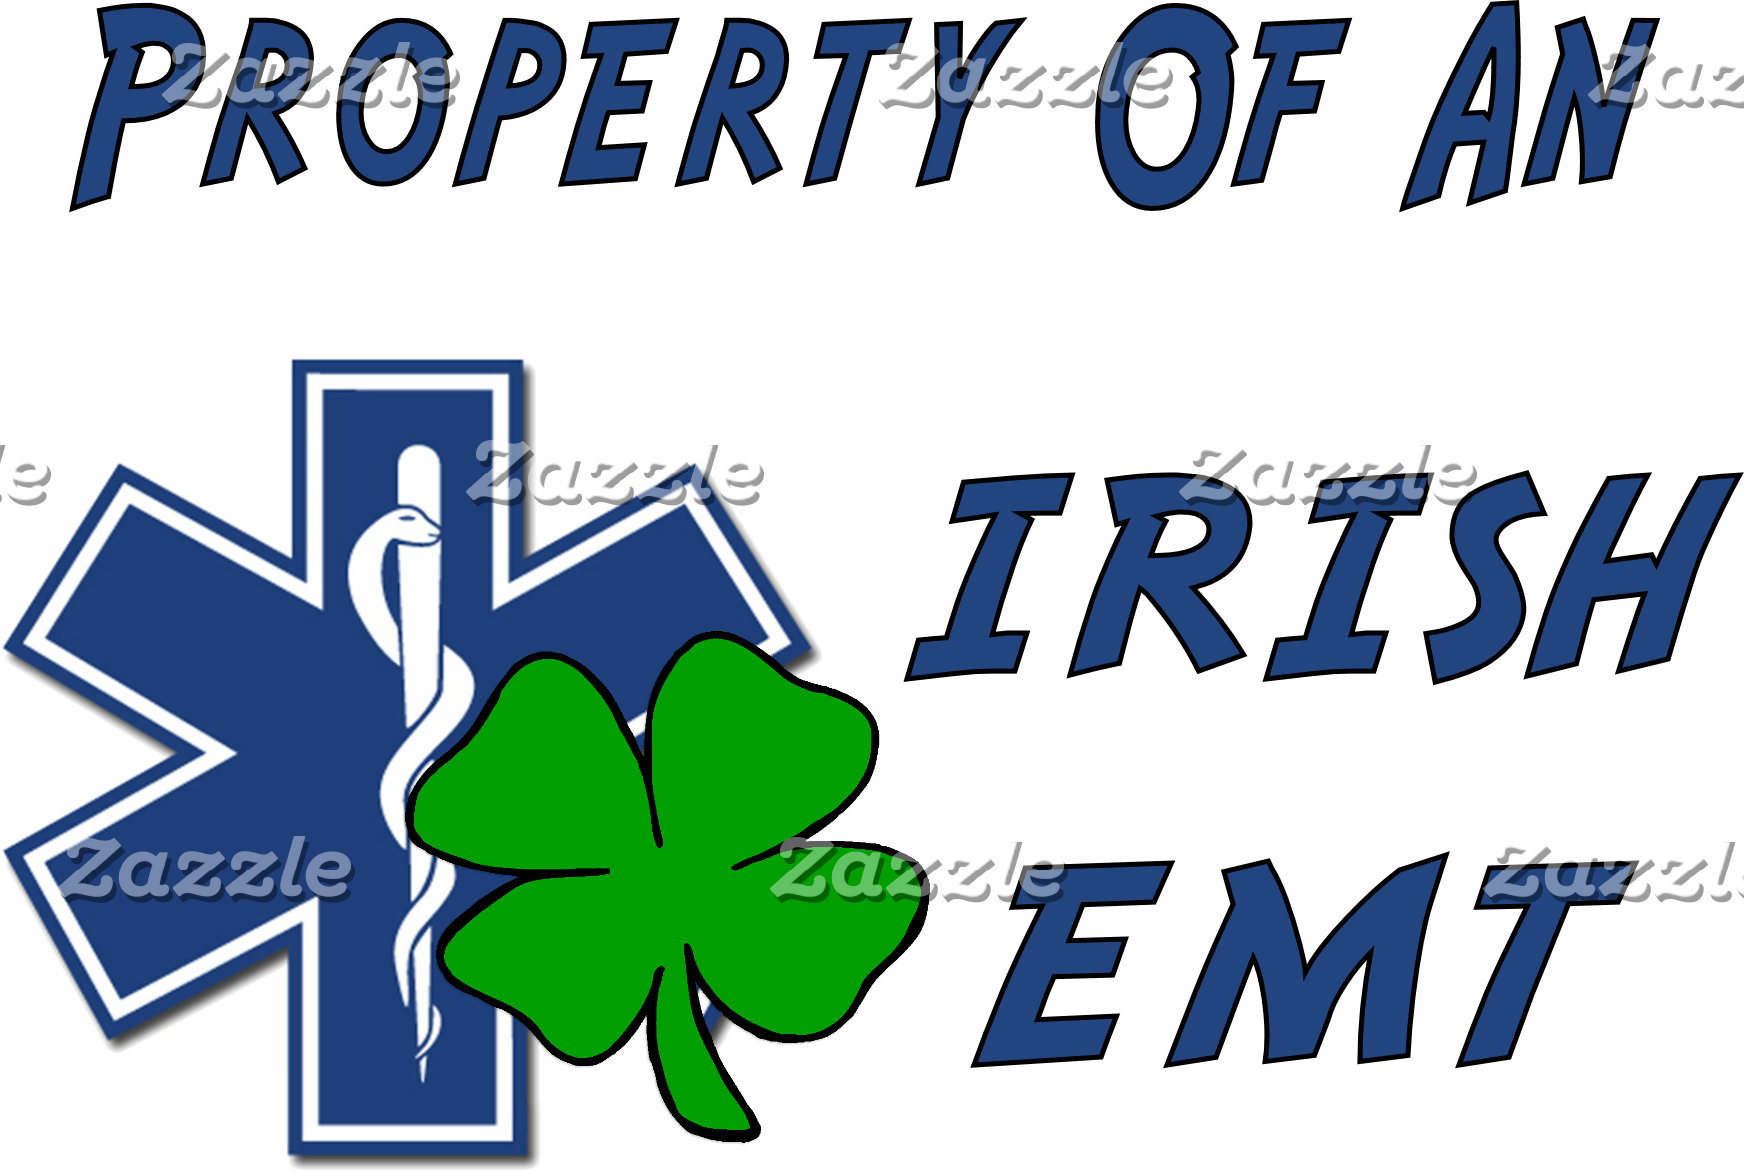 Irish EMT Property